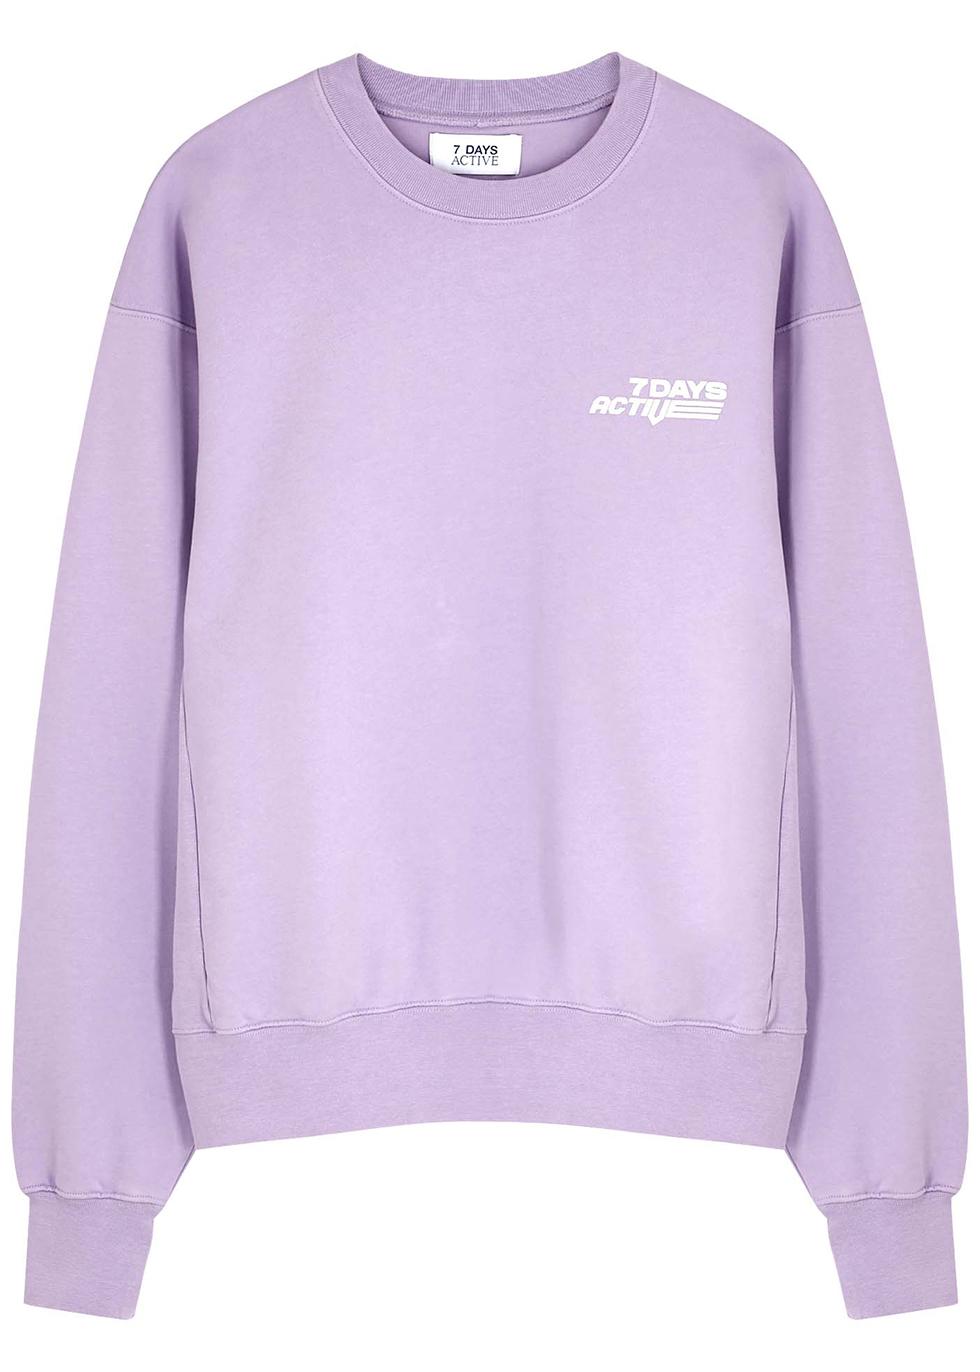 Monday purple cotton sweatshirt